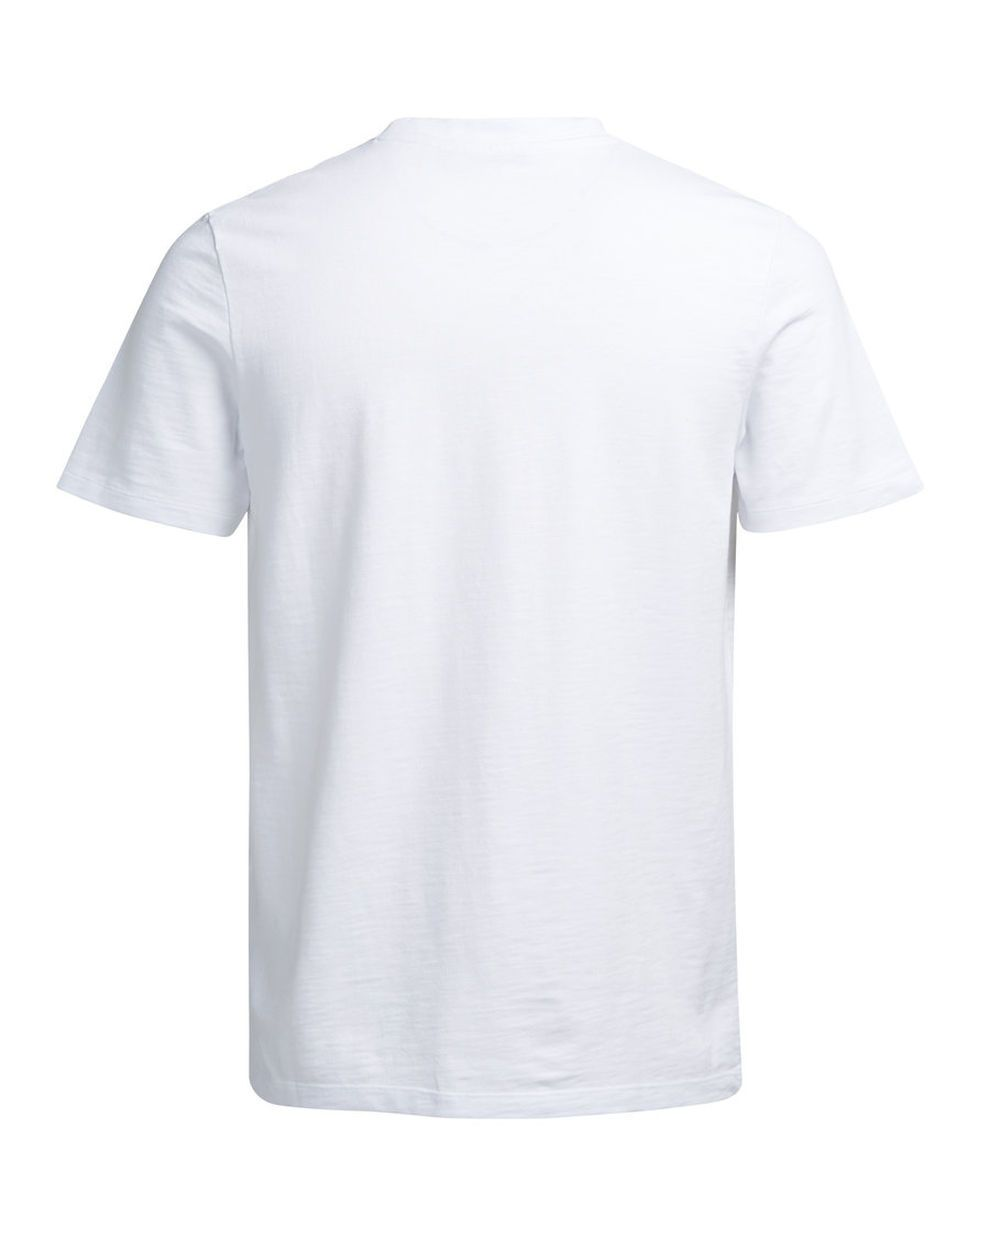 Short Sleeved T Shirt Baju Kaos Pakaian Model Pakaian